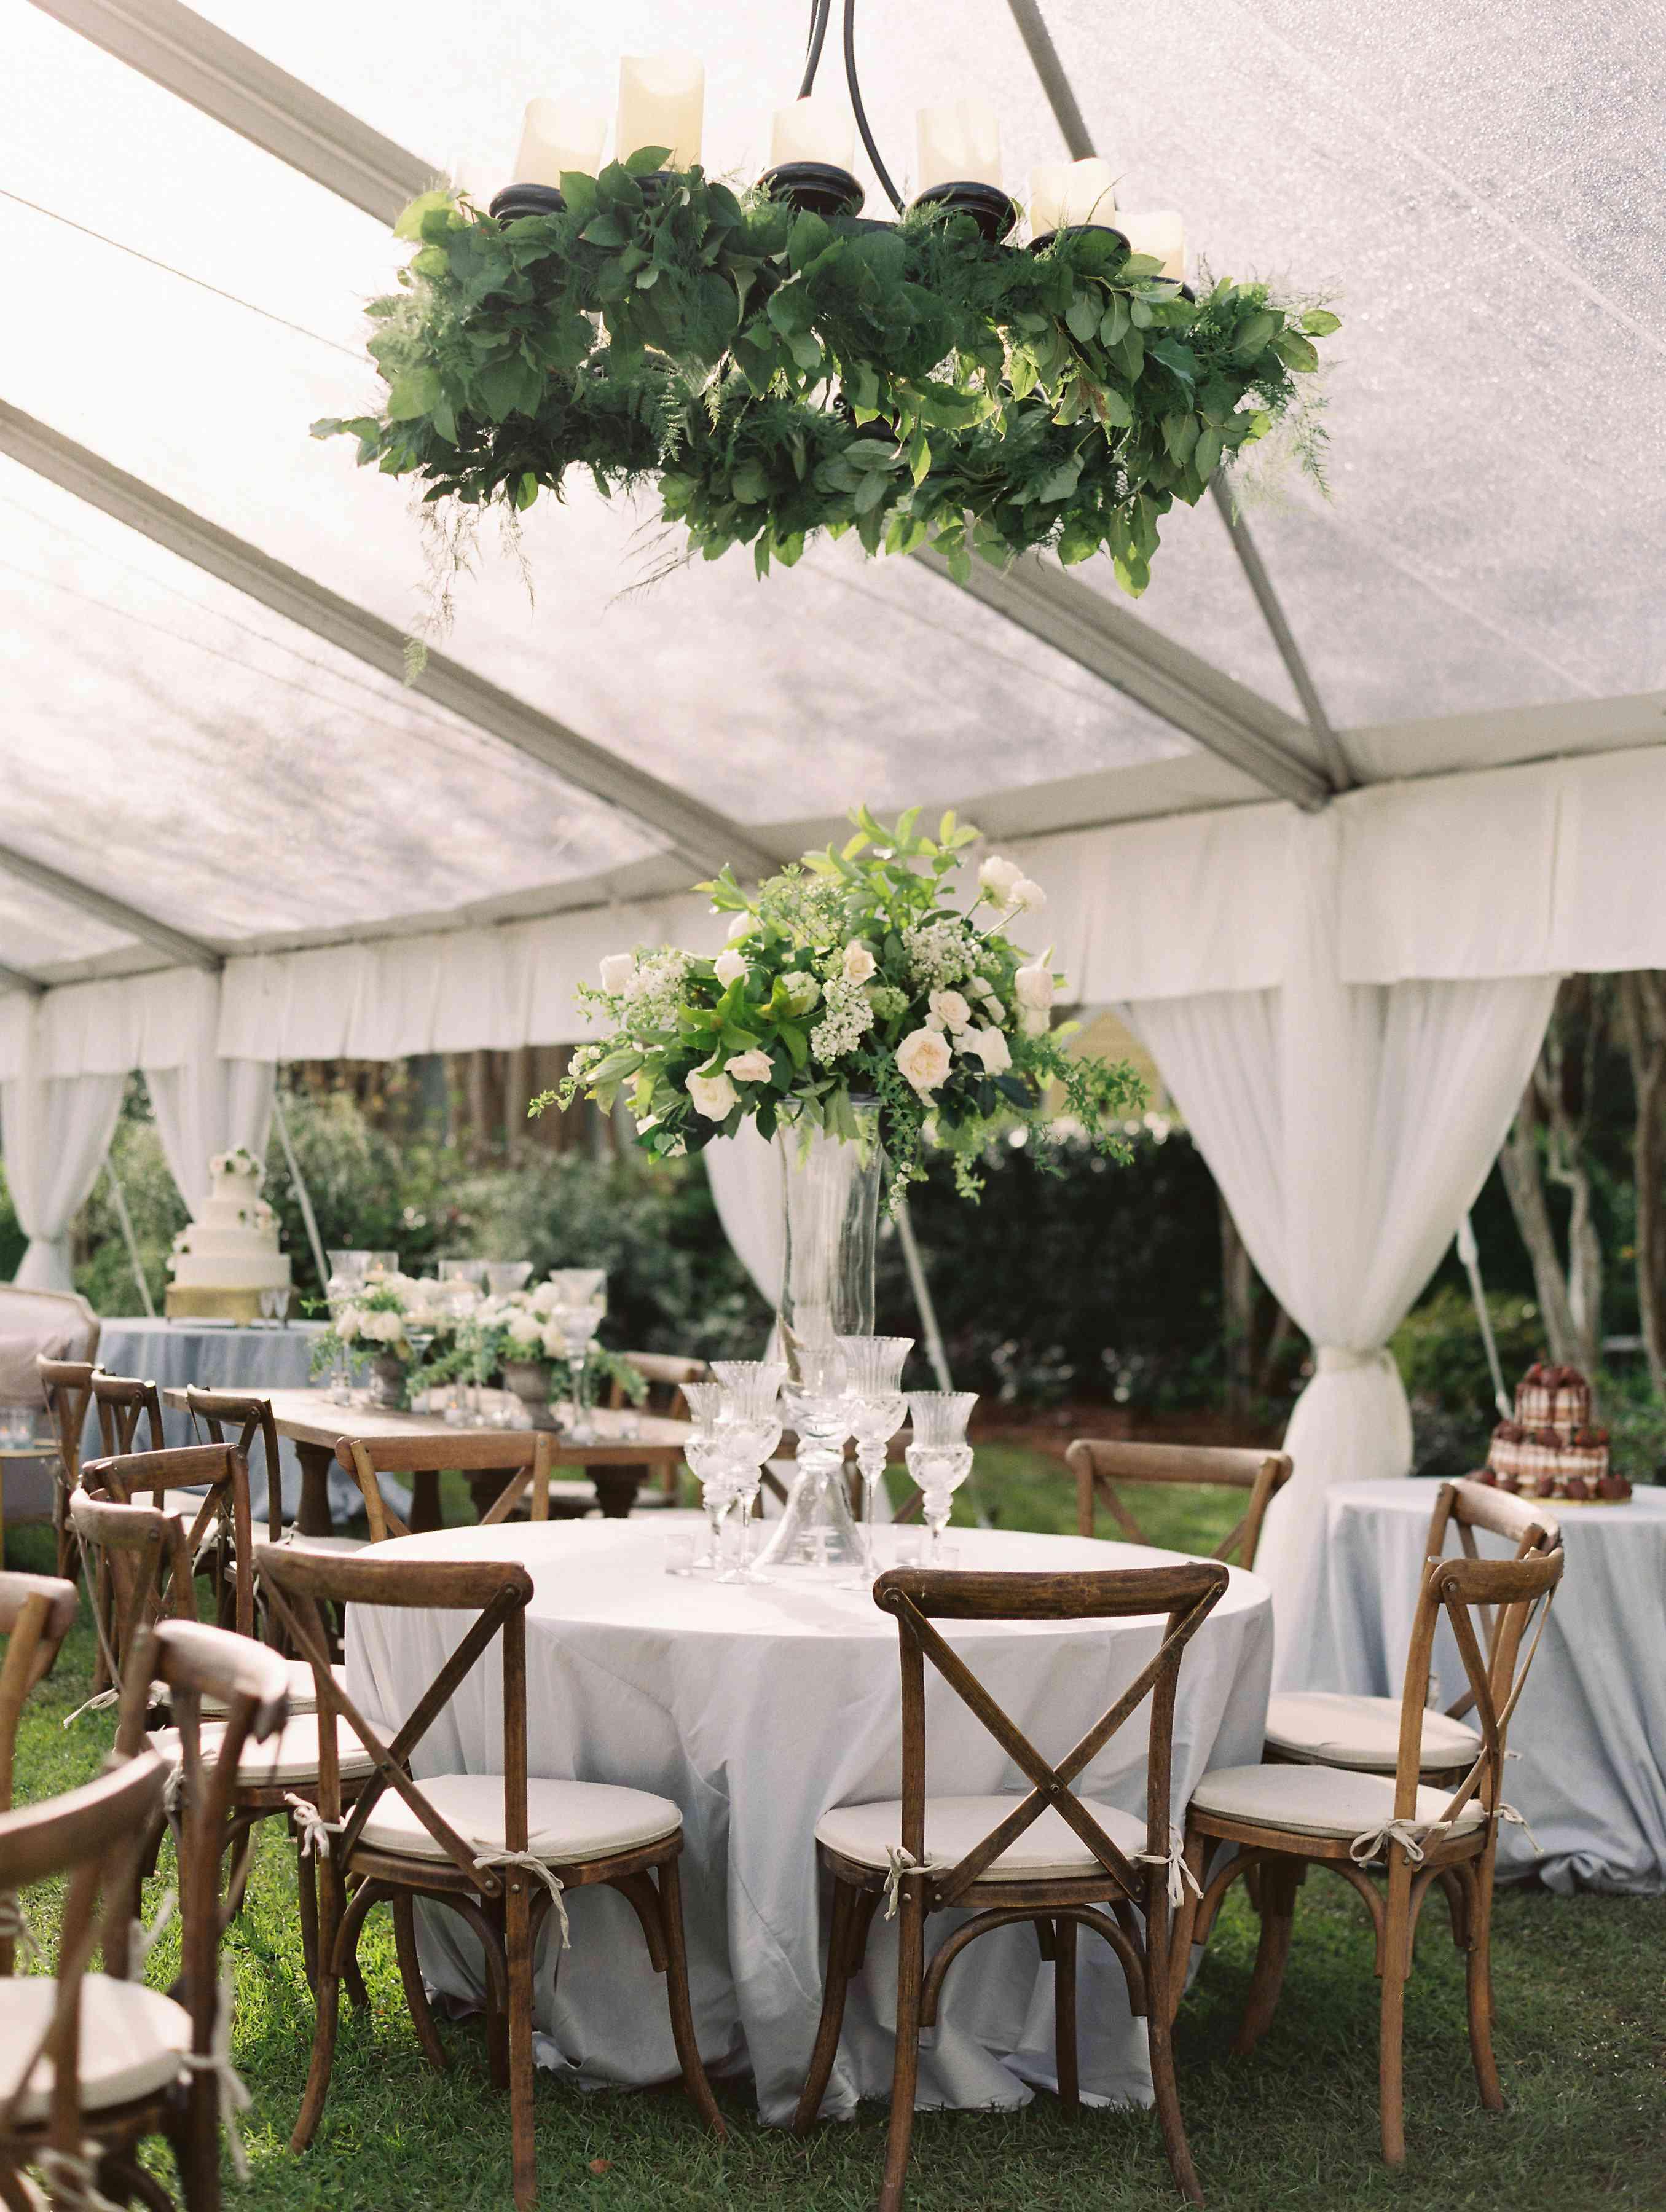 Reception setup with greenery